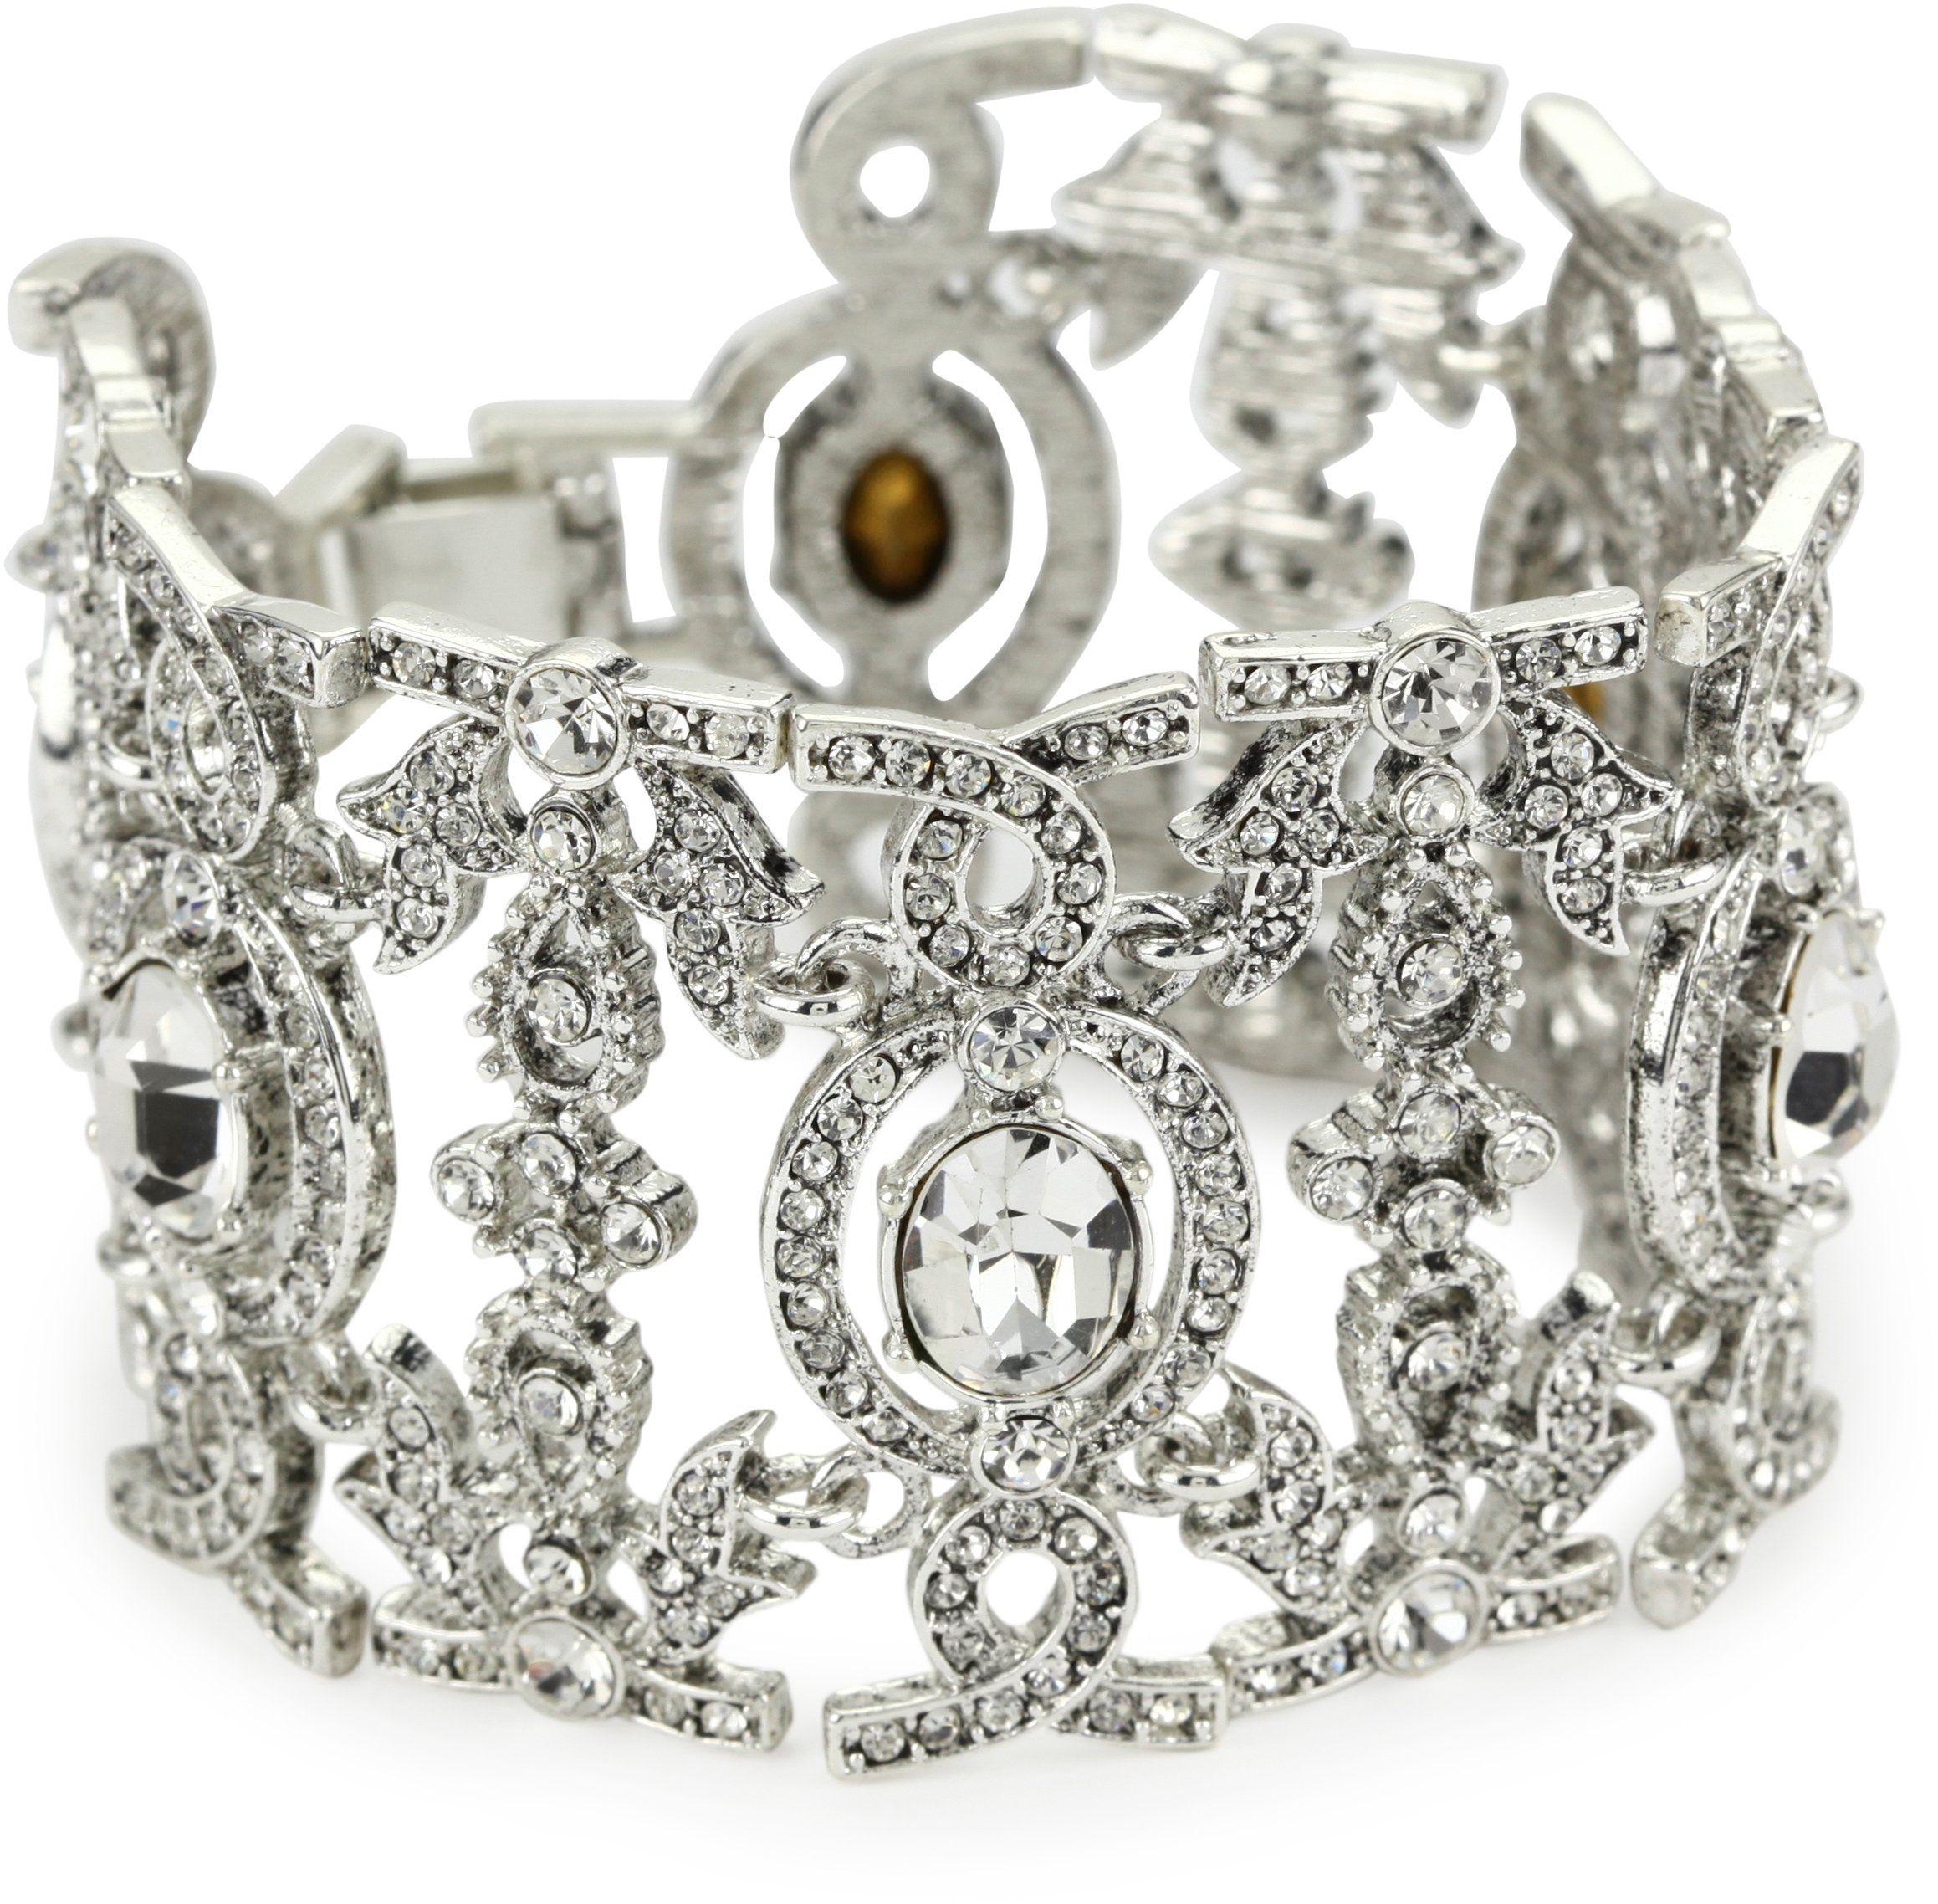 Jewelry nina uangelicau antique silver crystal statement bracelet